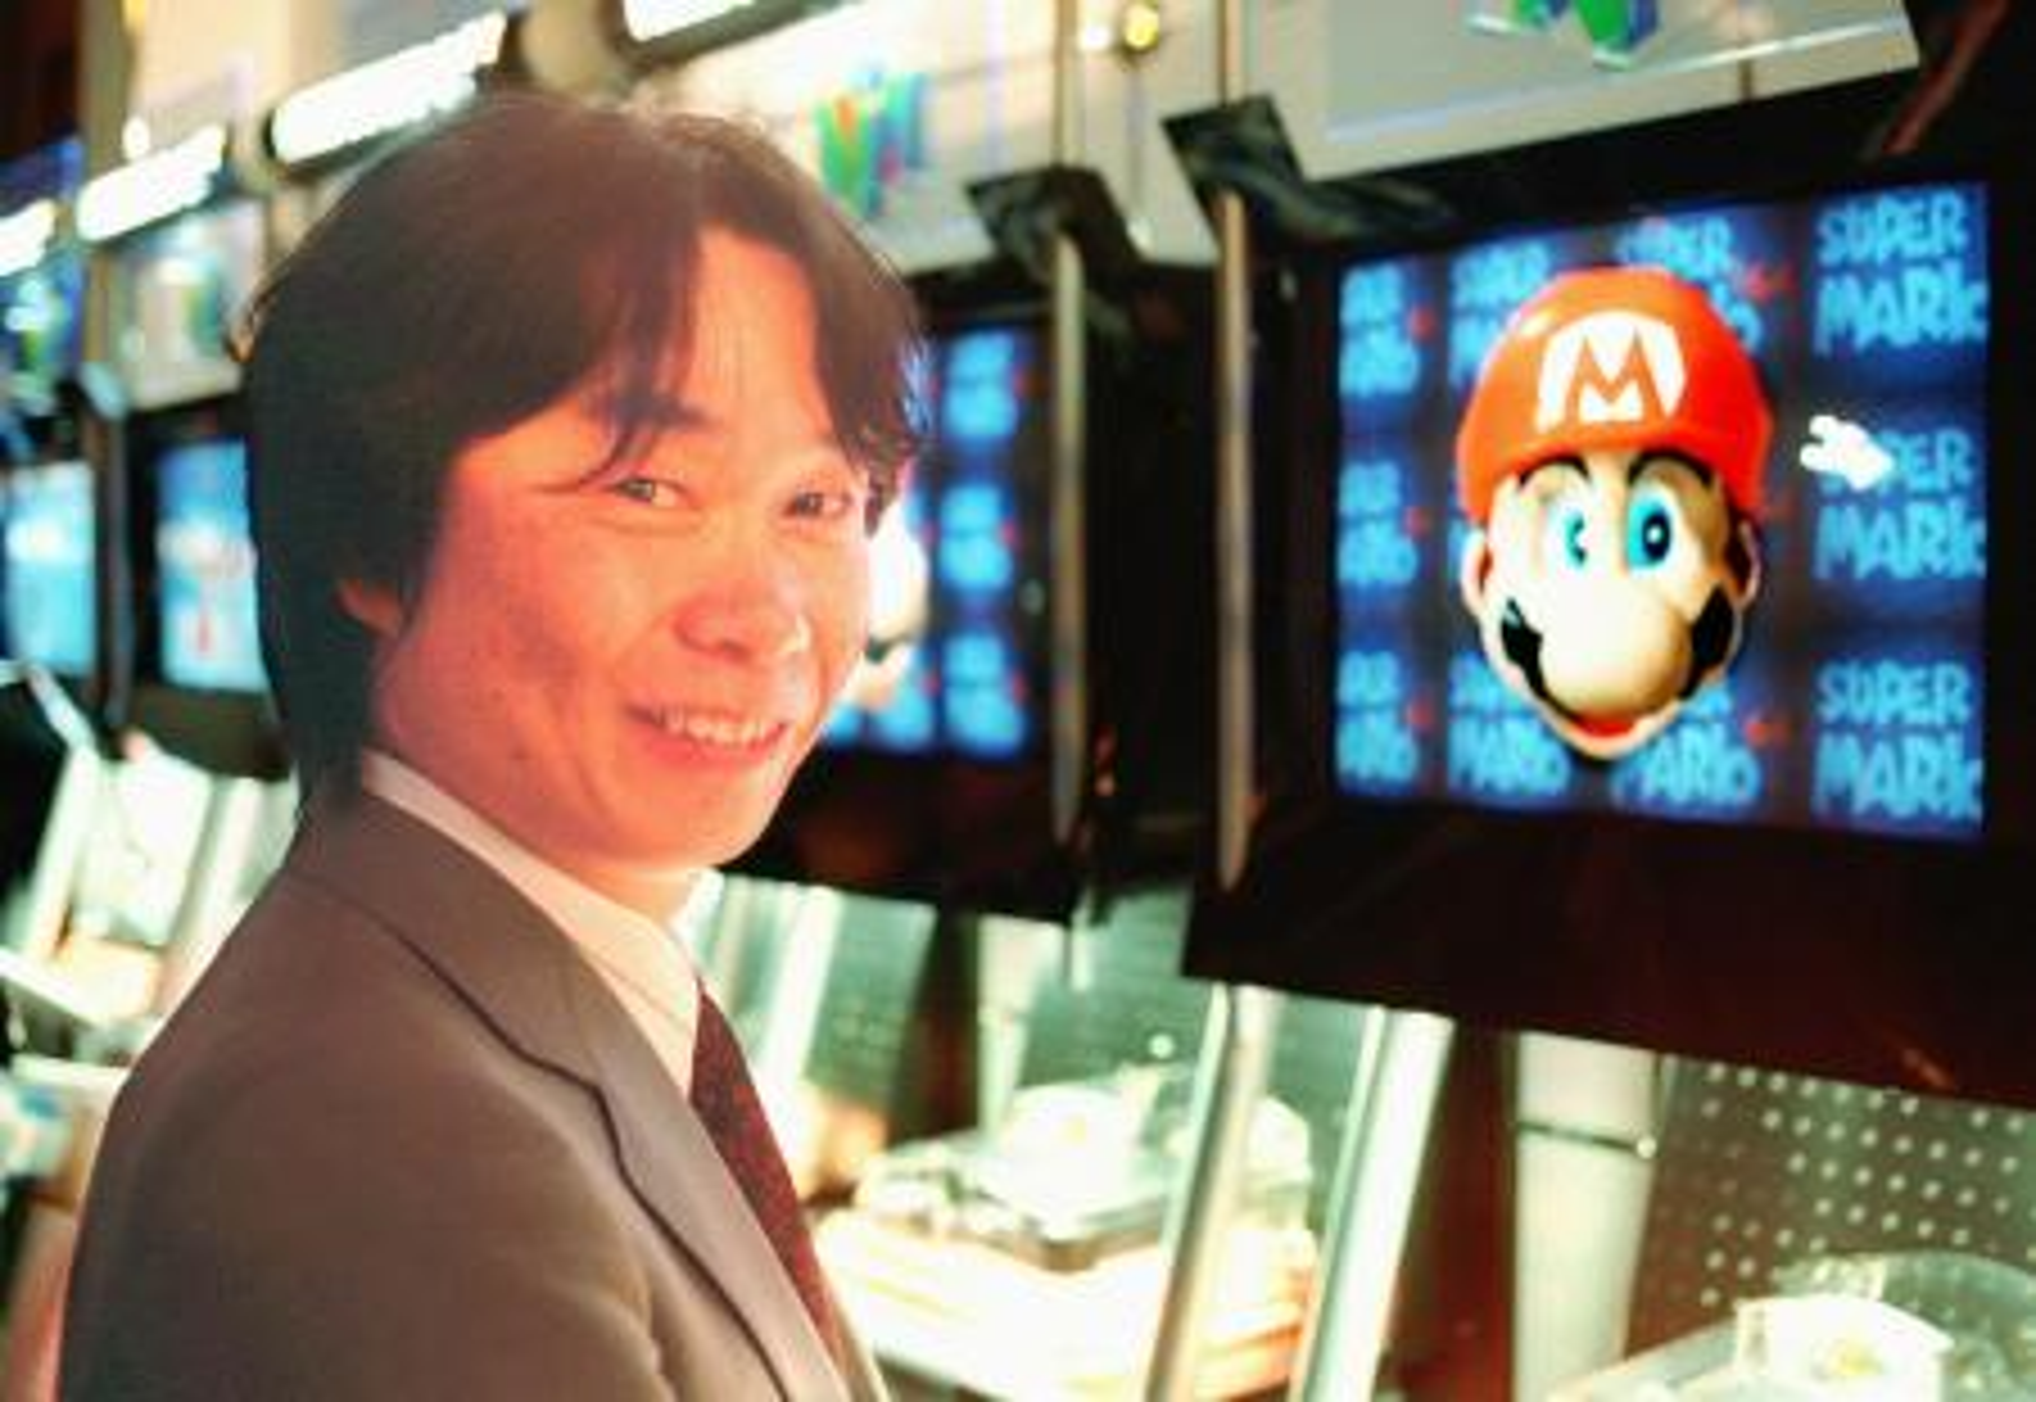 Shigeru Miyamoto in front of a screen displaying with his creation, Mario